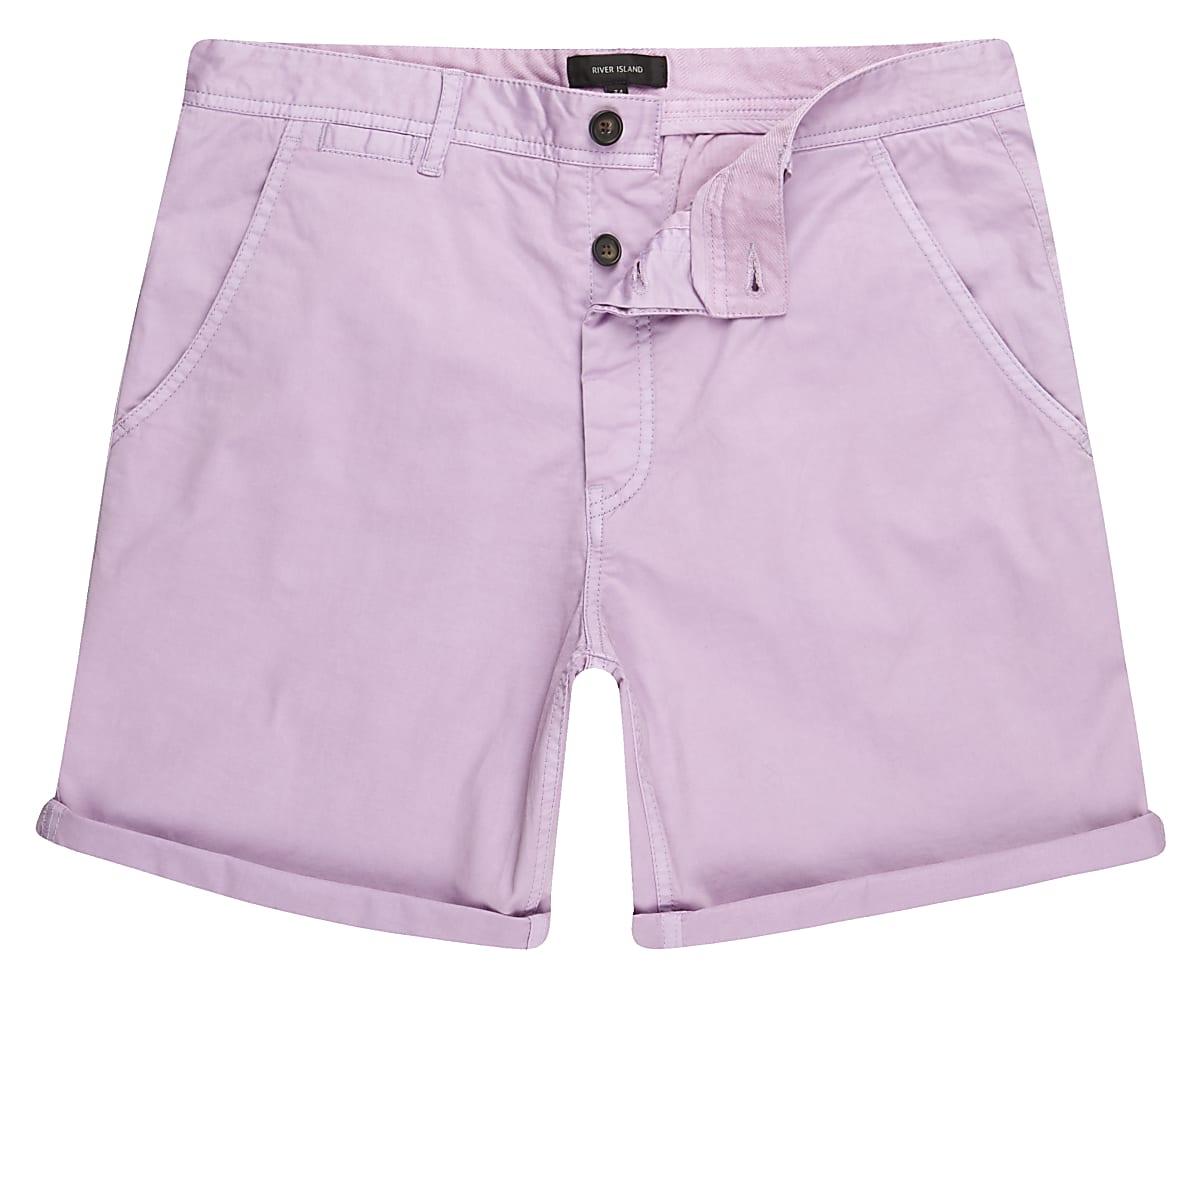 Light purple slim fit chino shorts